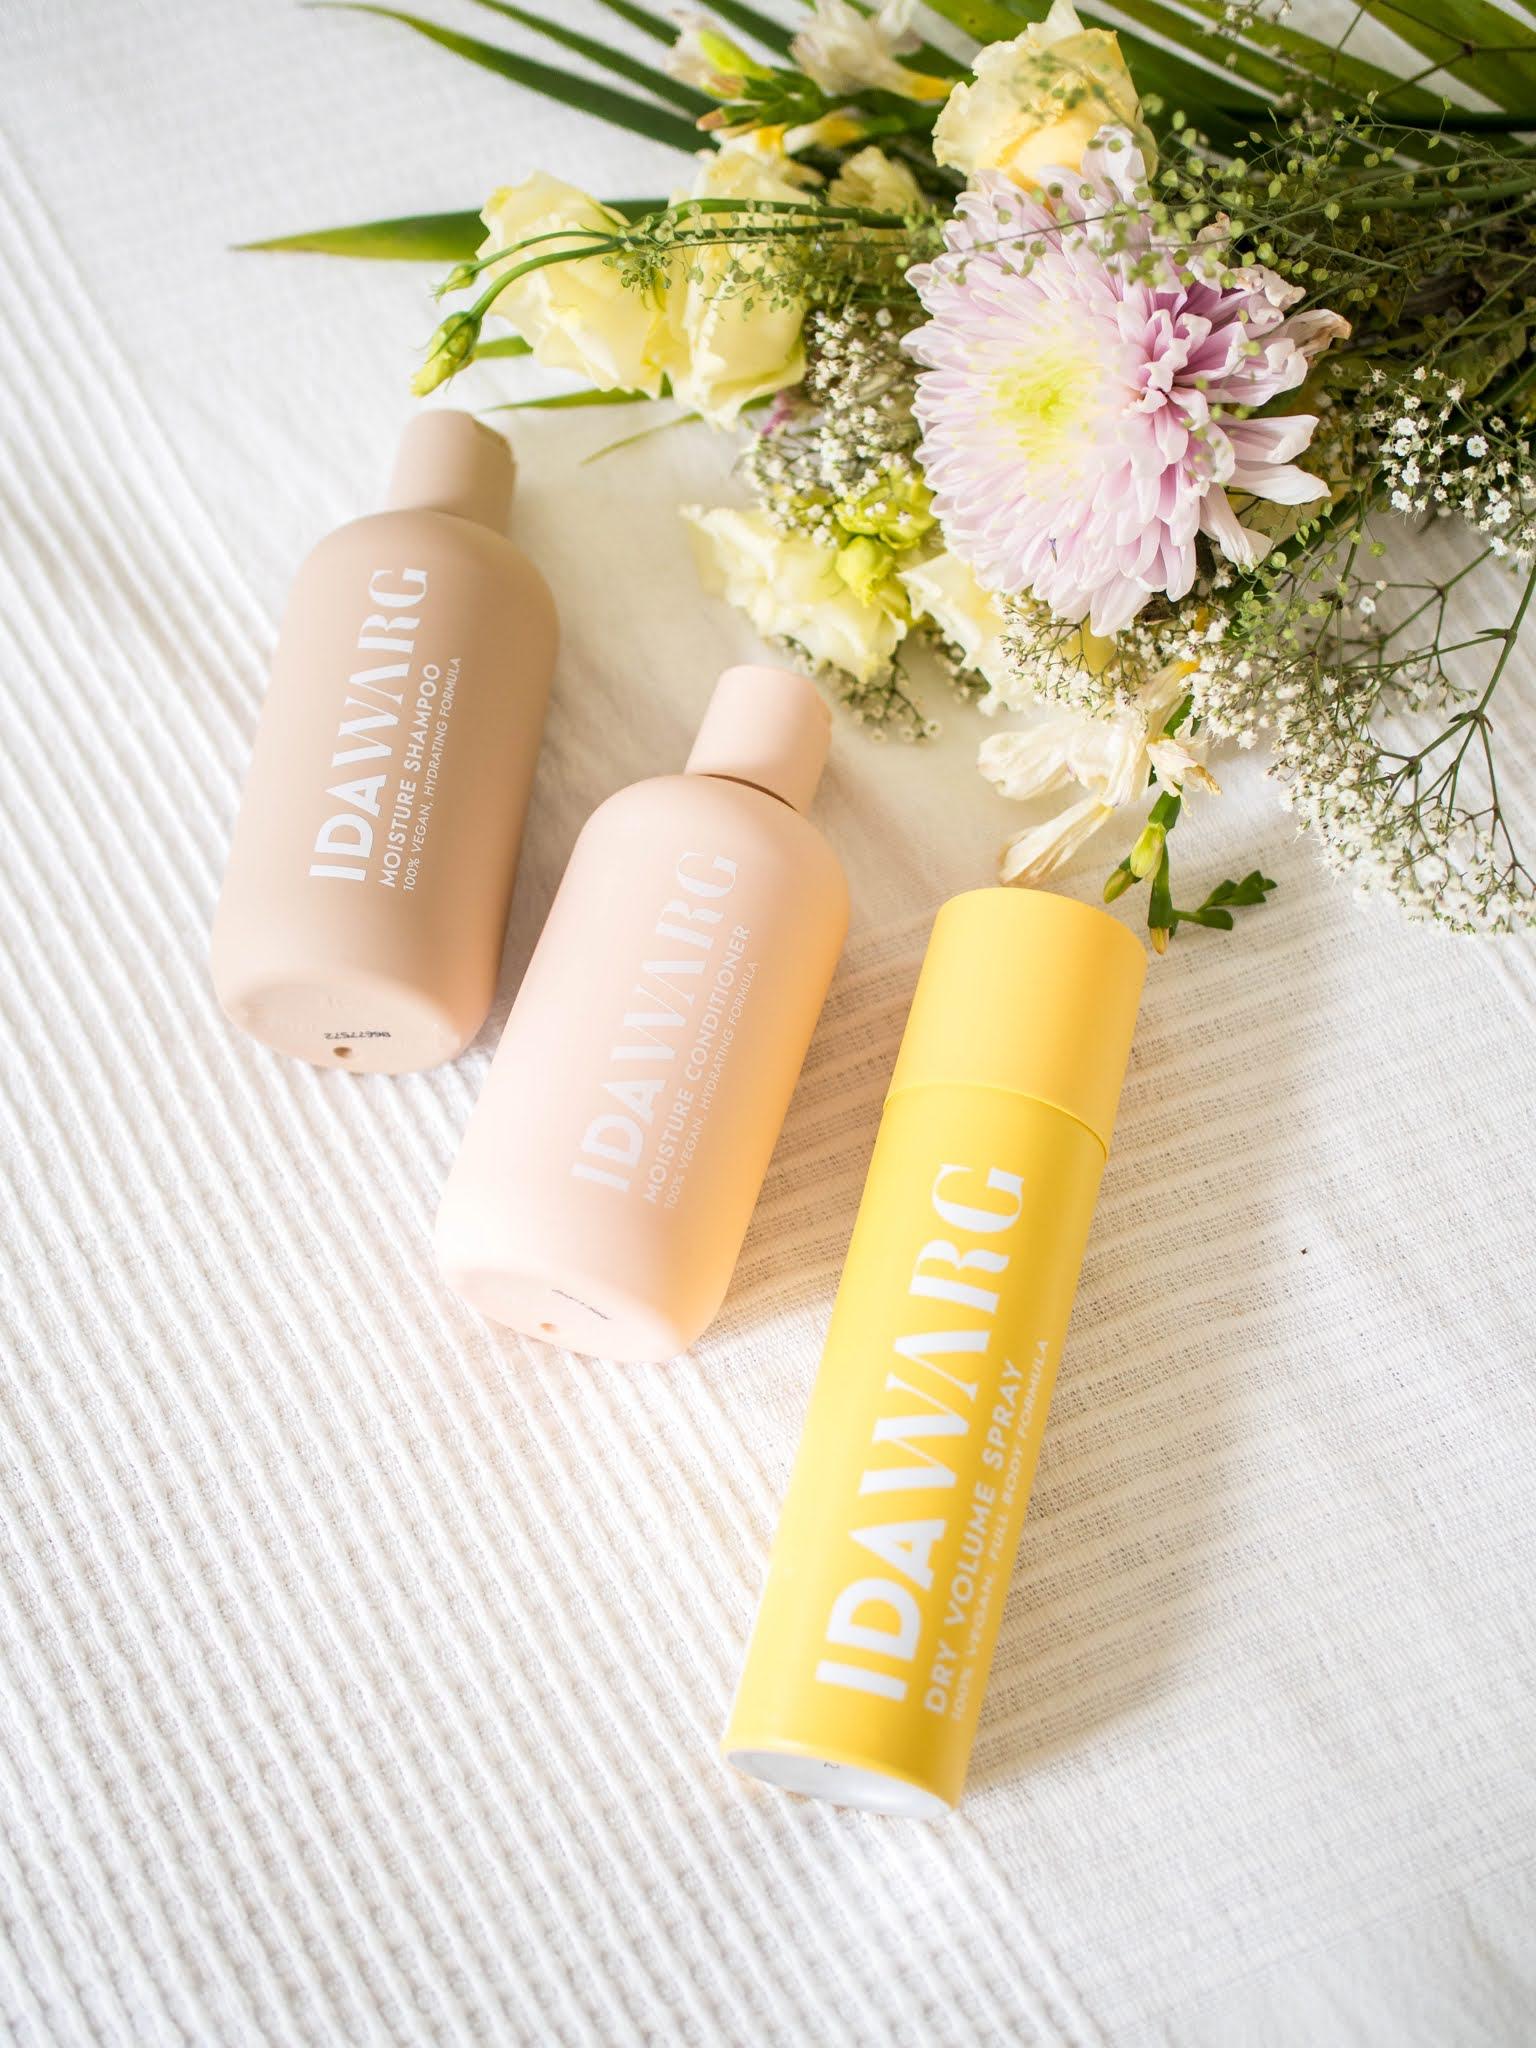 Ida Warg Moisture Shampoo + Conditioner, Dry Volume Spray